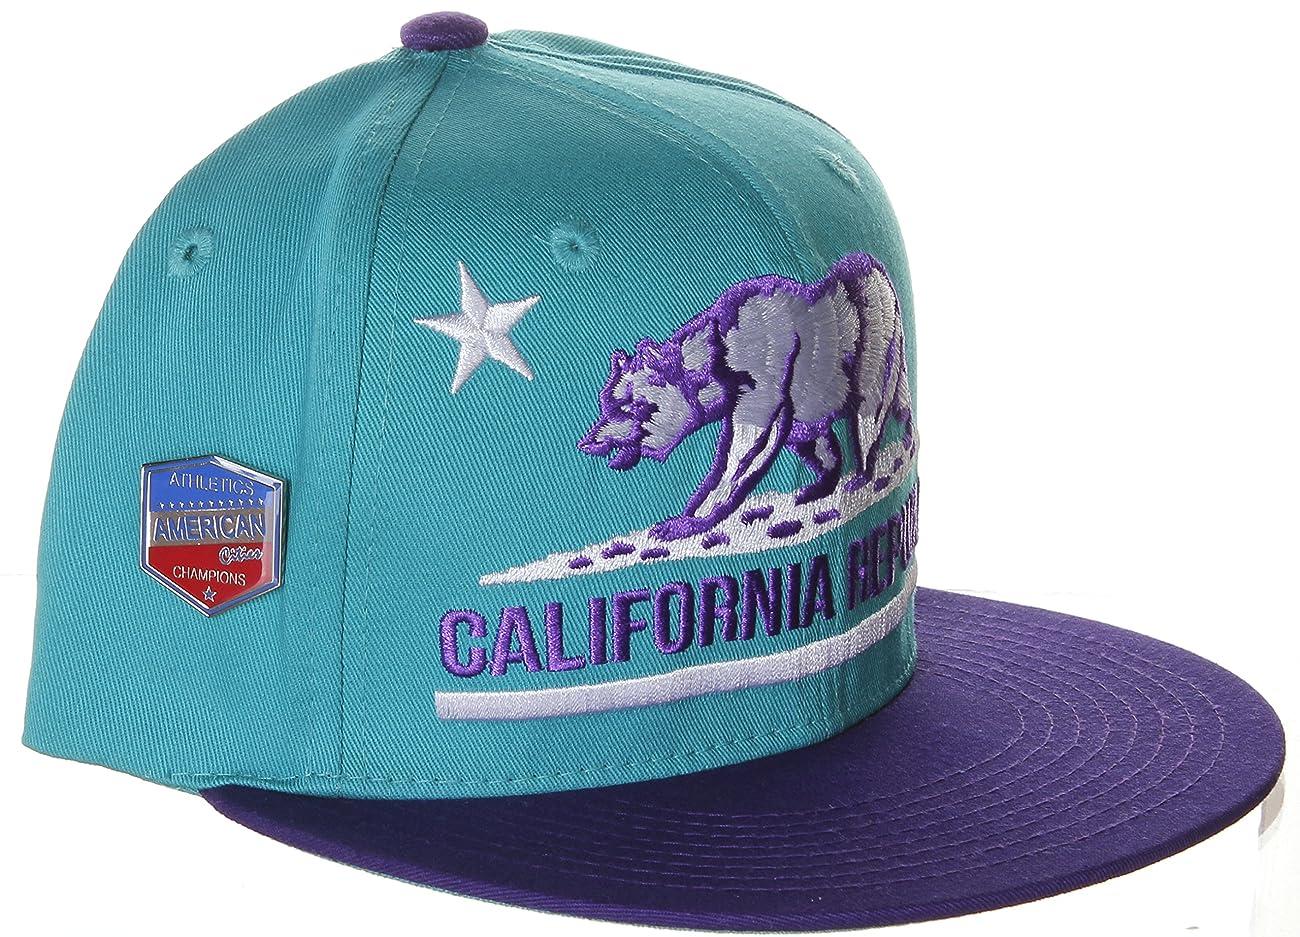 California Republic Flat Bill Vintage Style Snapback Hat Cap 4